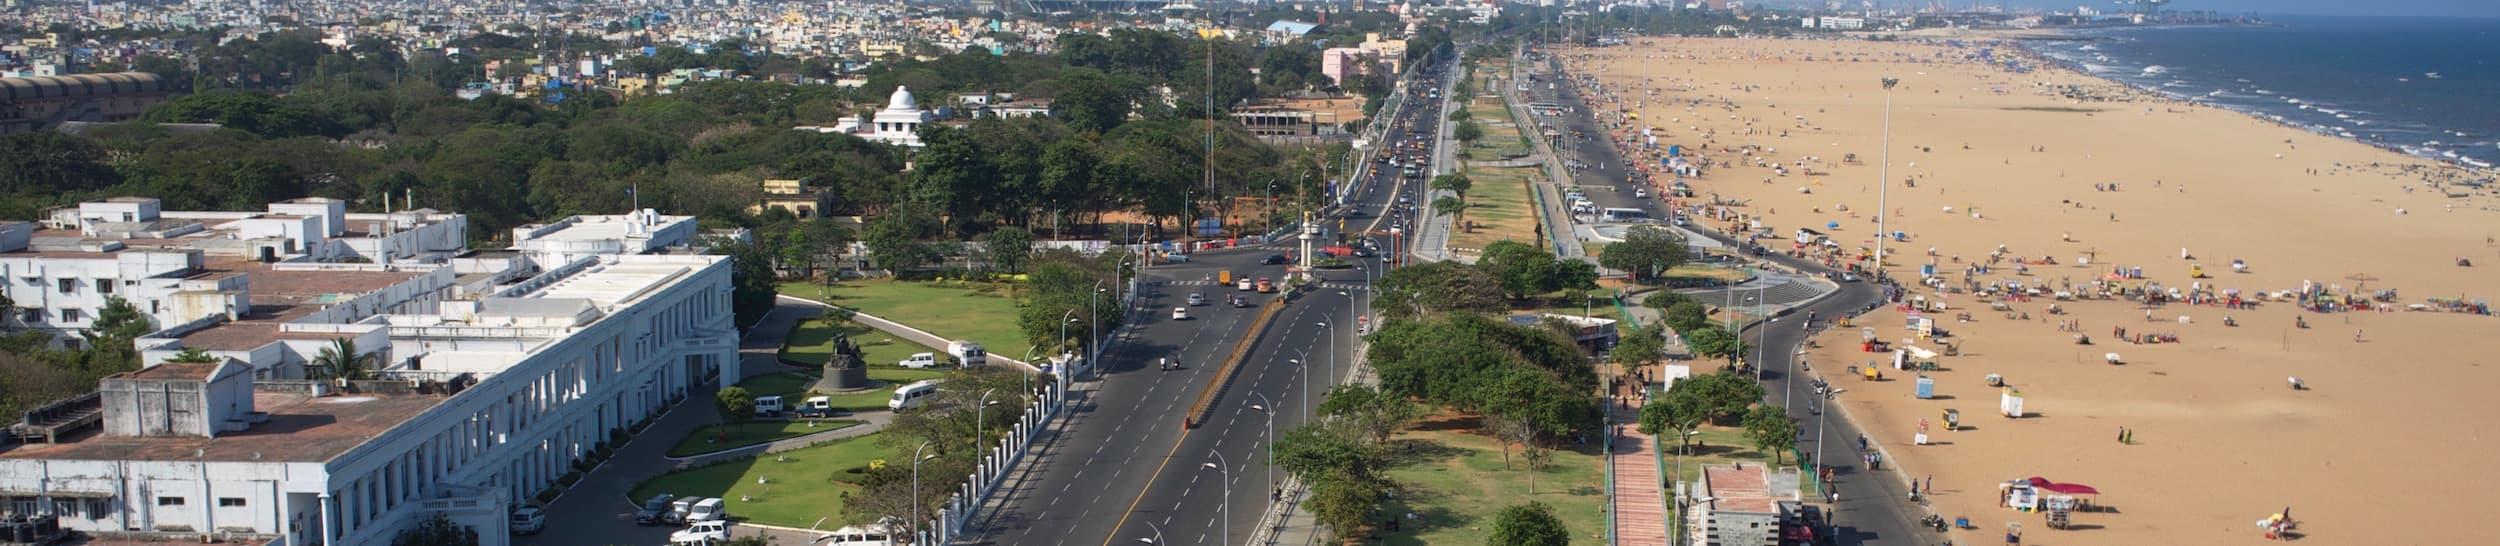 Pictured: skyline of Chennai